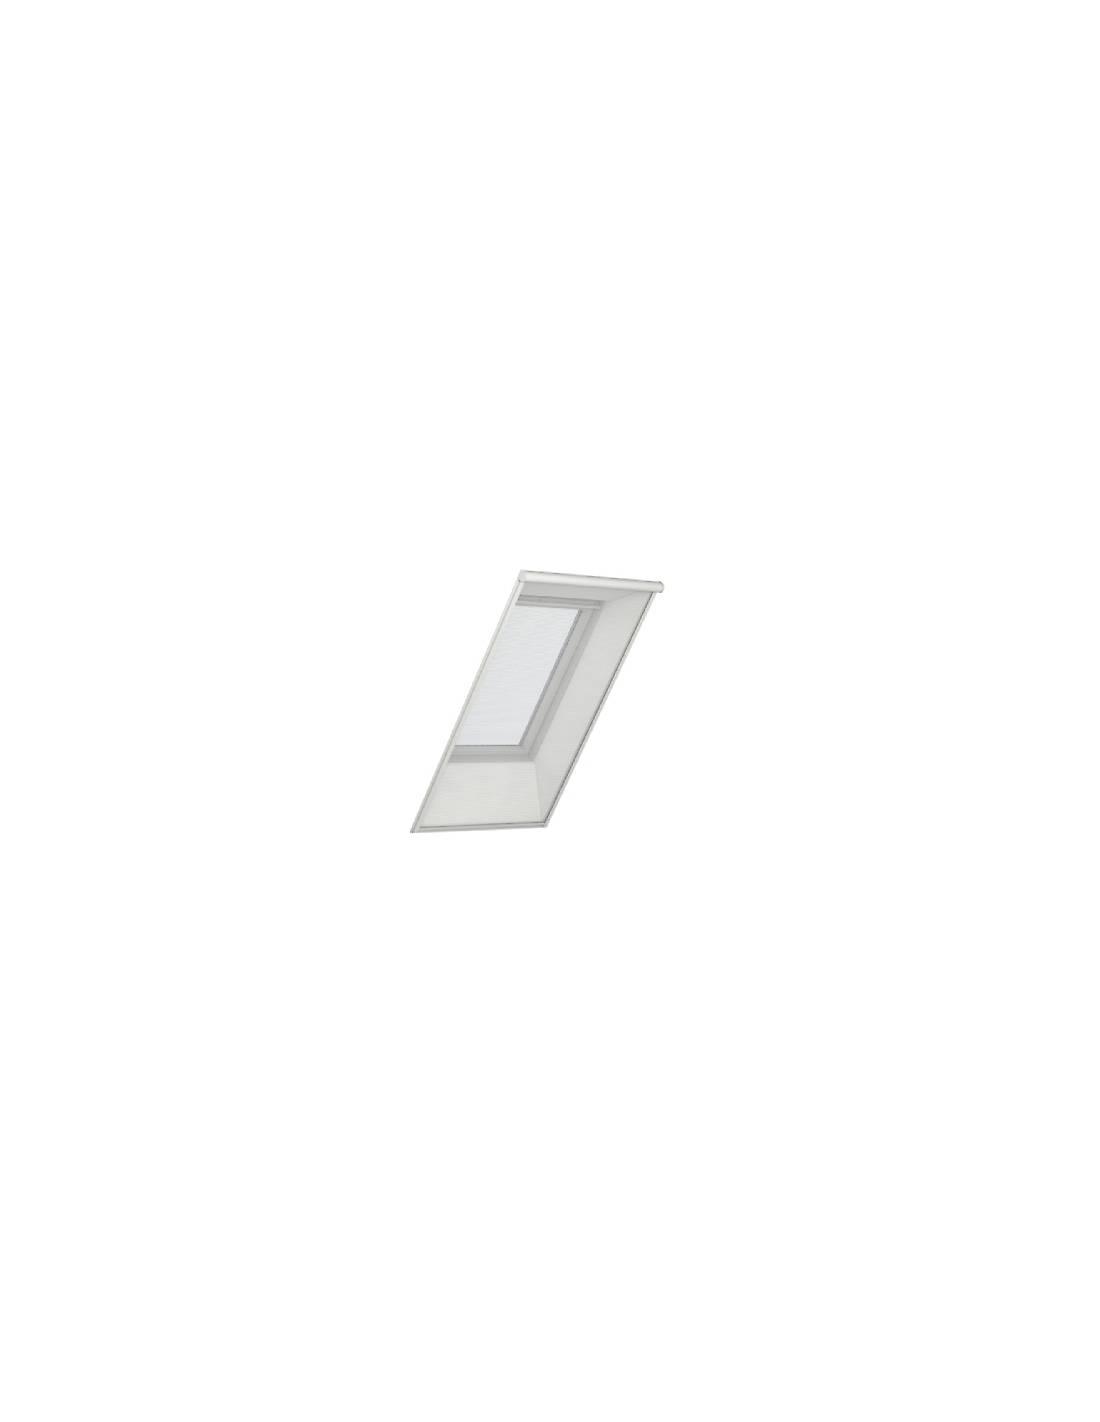 Velux zil zanzariera for Finestre velux misure standard